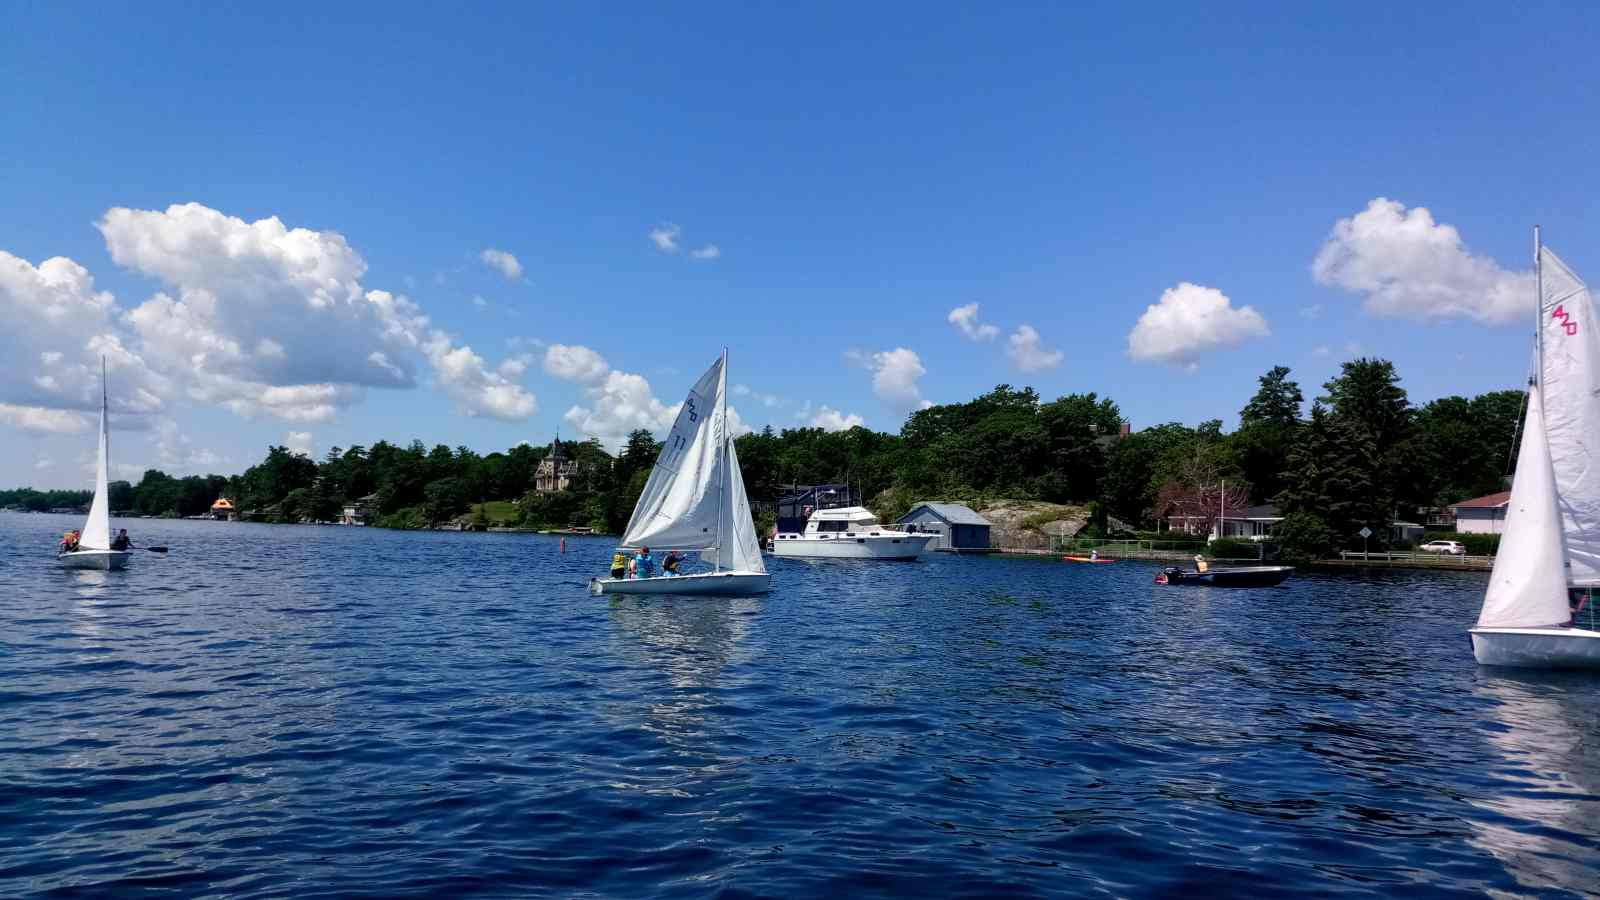 Brockville Yacht Club Sailing School 2017 club 420 1000 islands.jpg